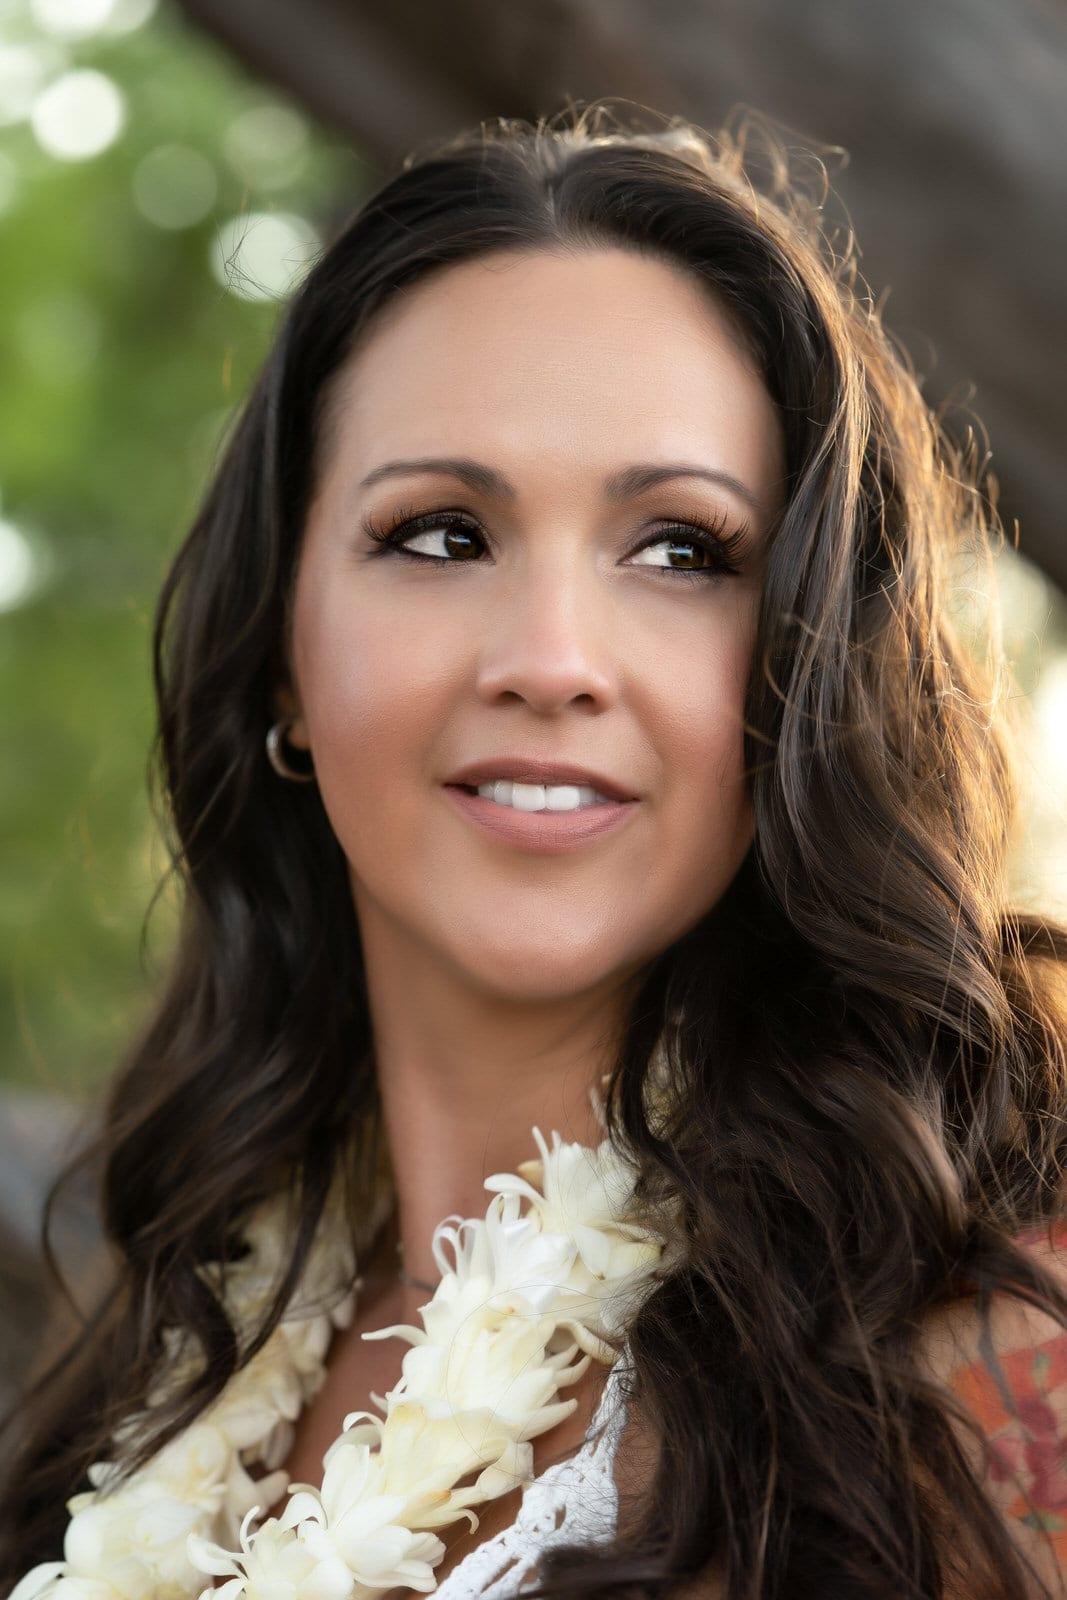 Big-Island-Wedding-Brides-LGBT-Hawaii-Photographer-Nohea-Point-7-1.jpg